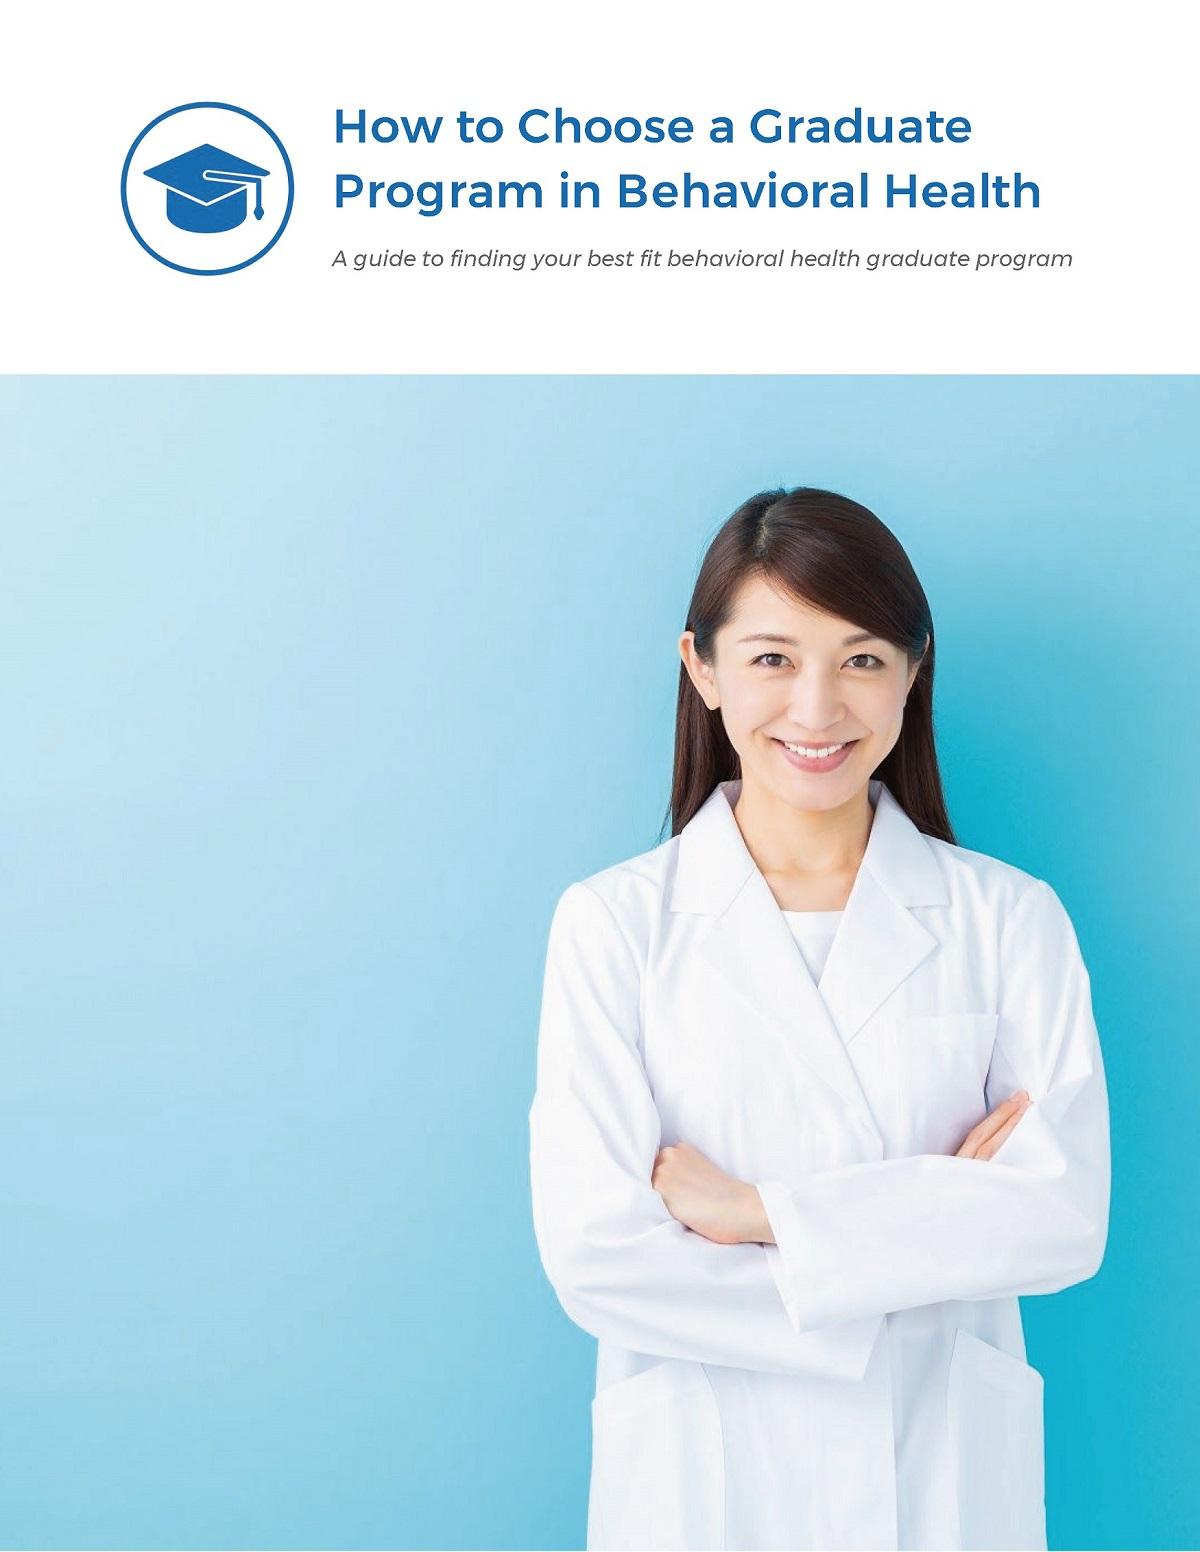 Guide How to Choose a Graduate Program in Behavior